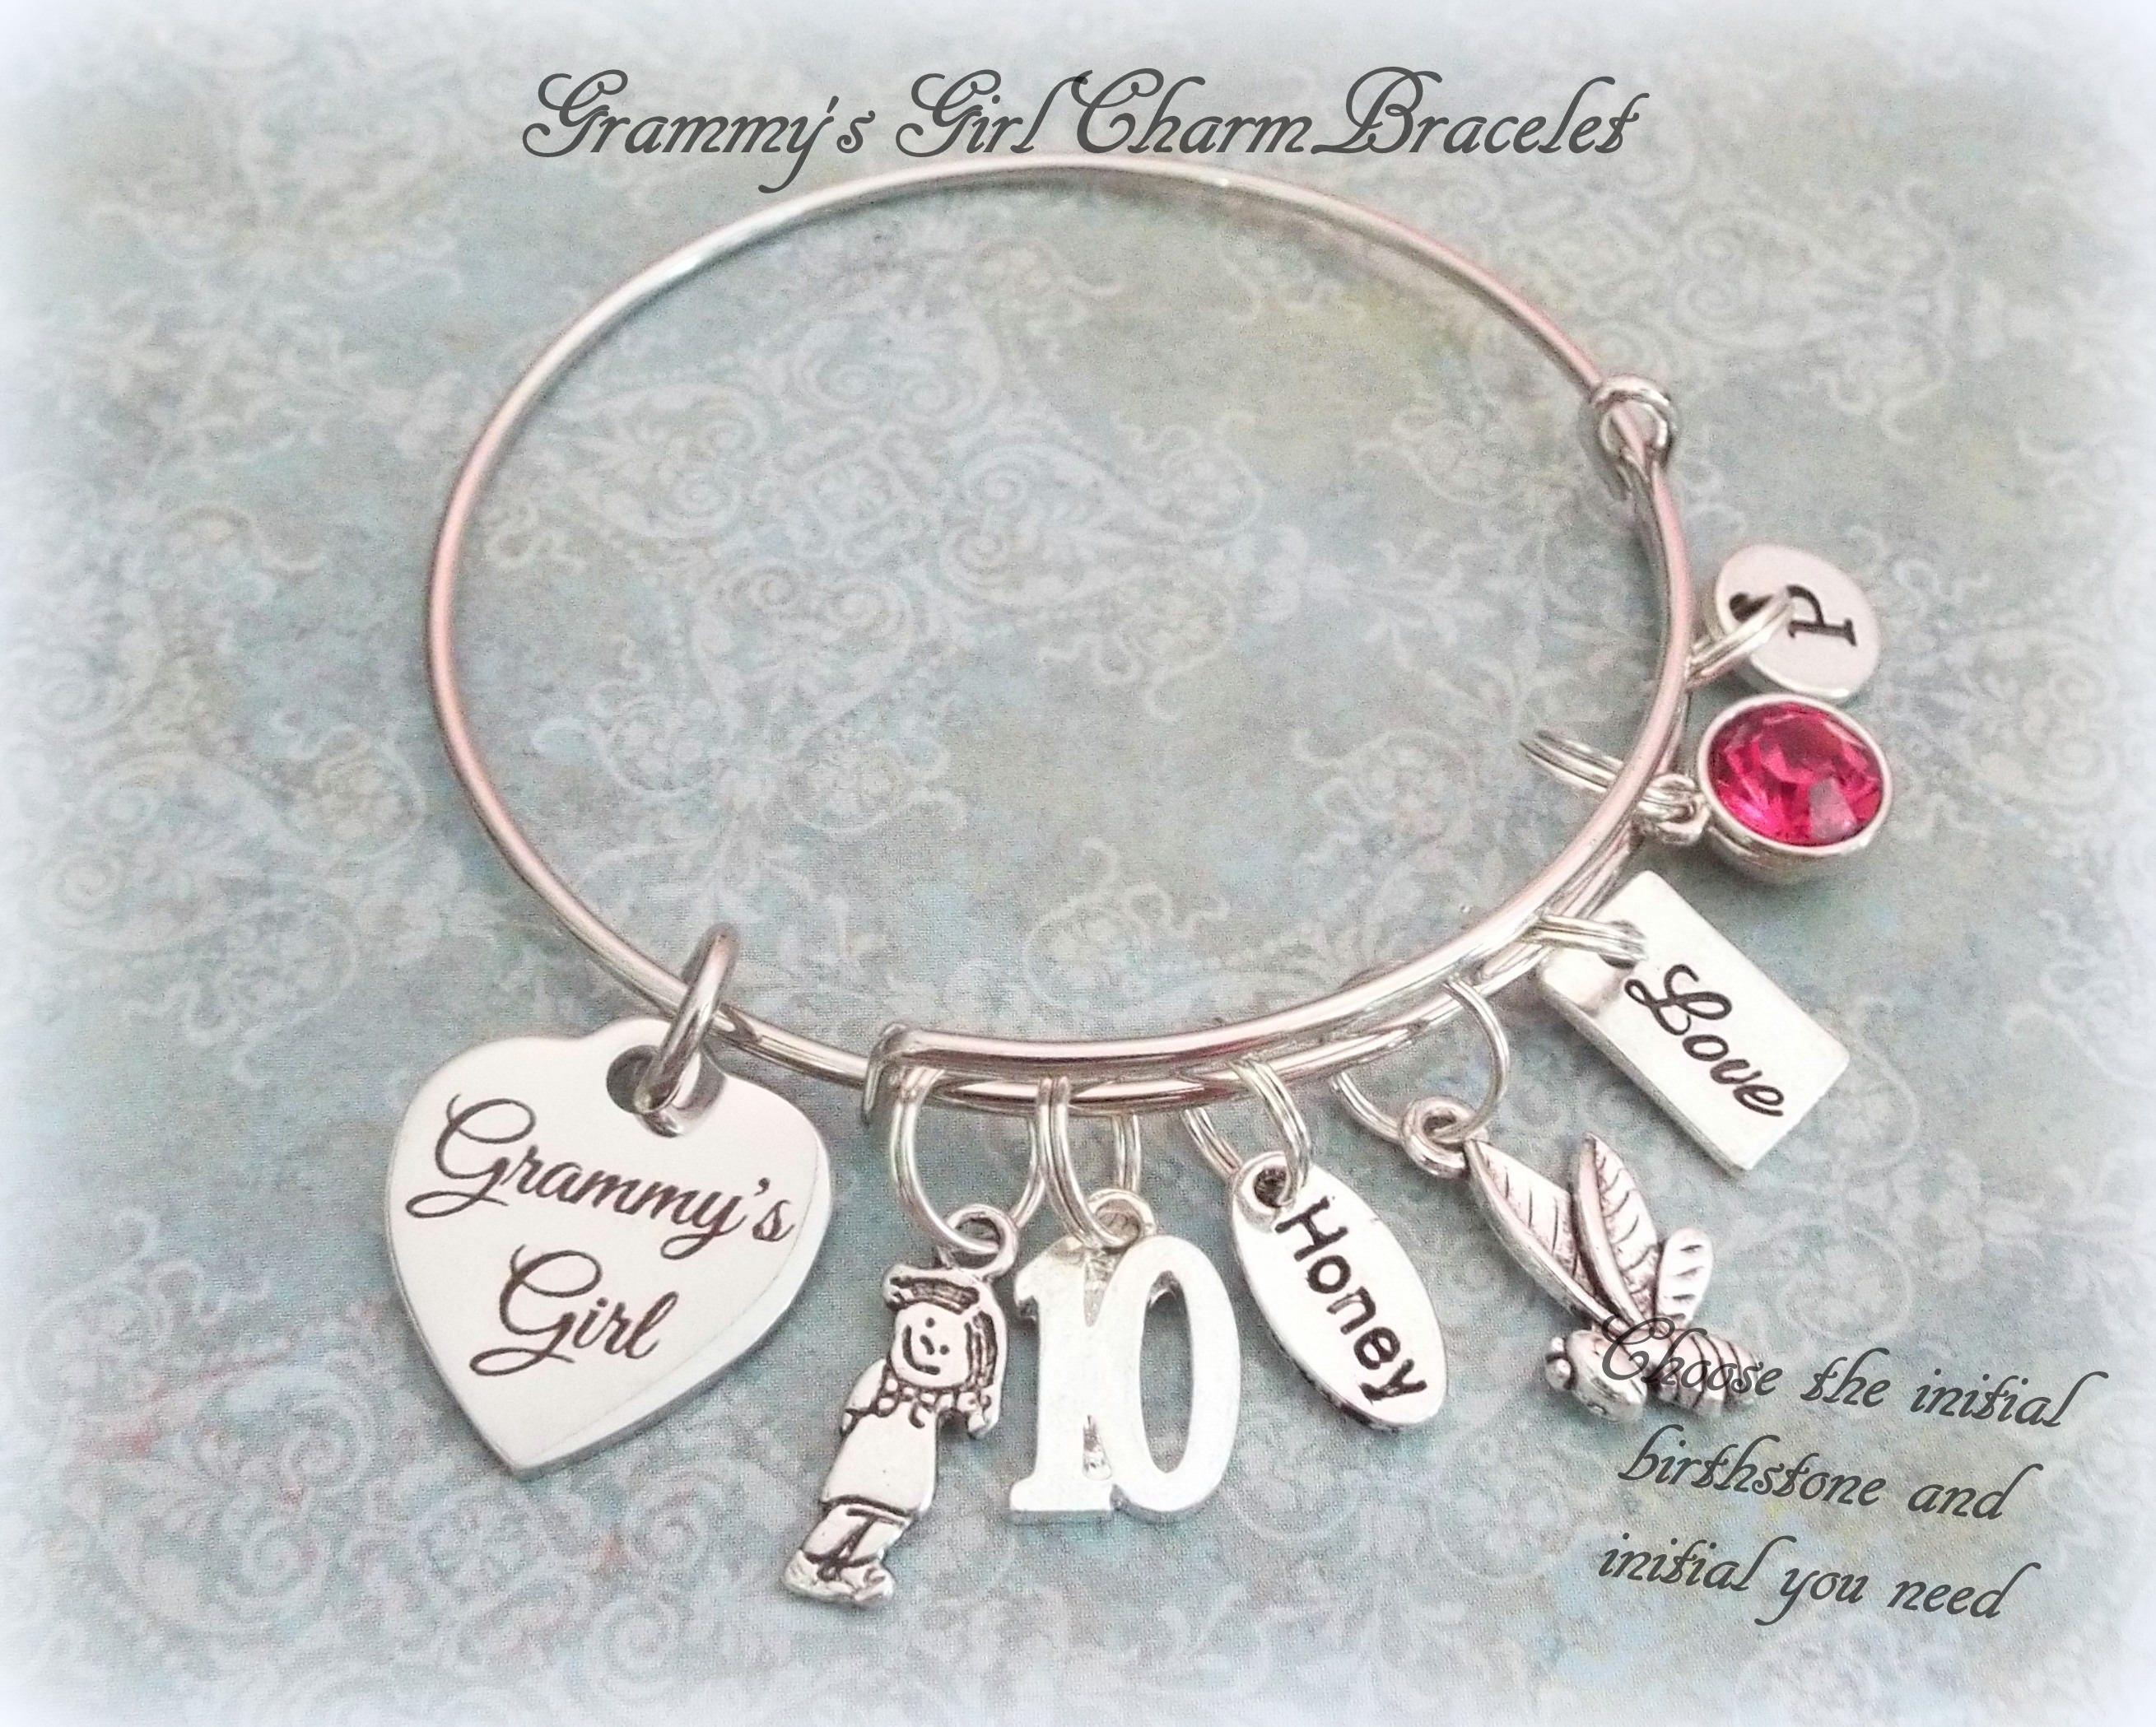 Gift Idea For Granddaughter 10th Birthday Charm Bracelet Happy